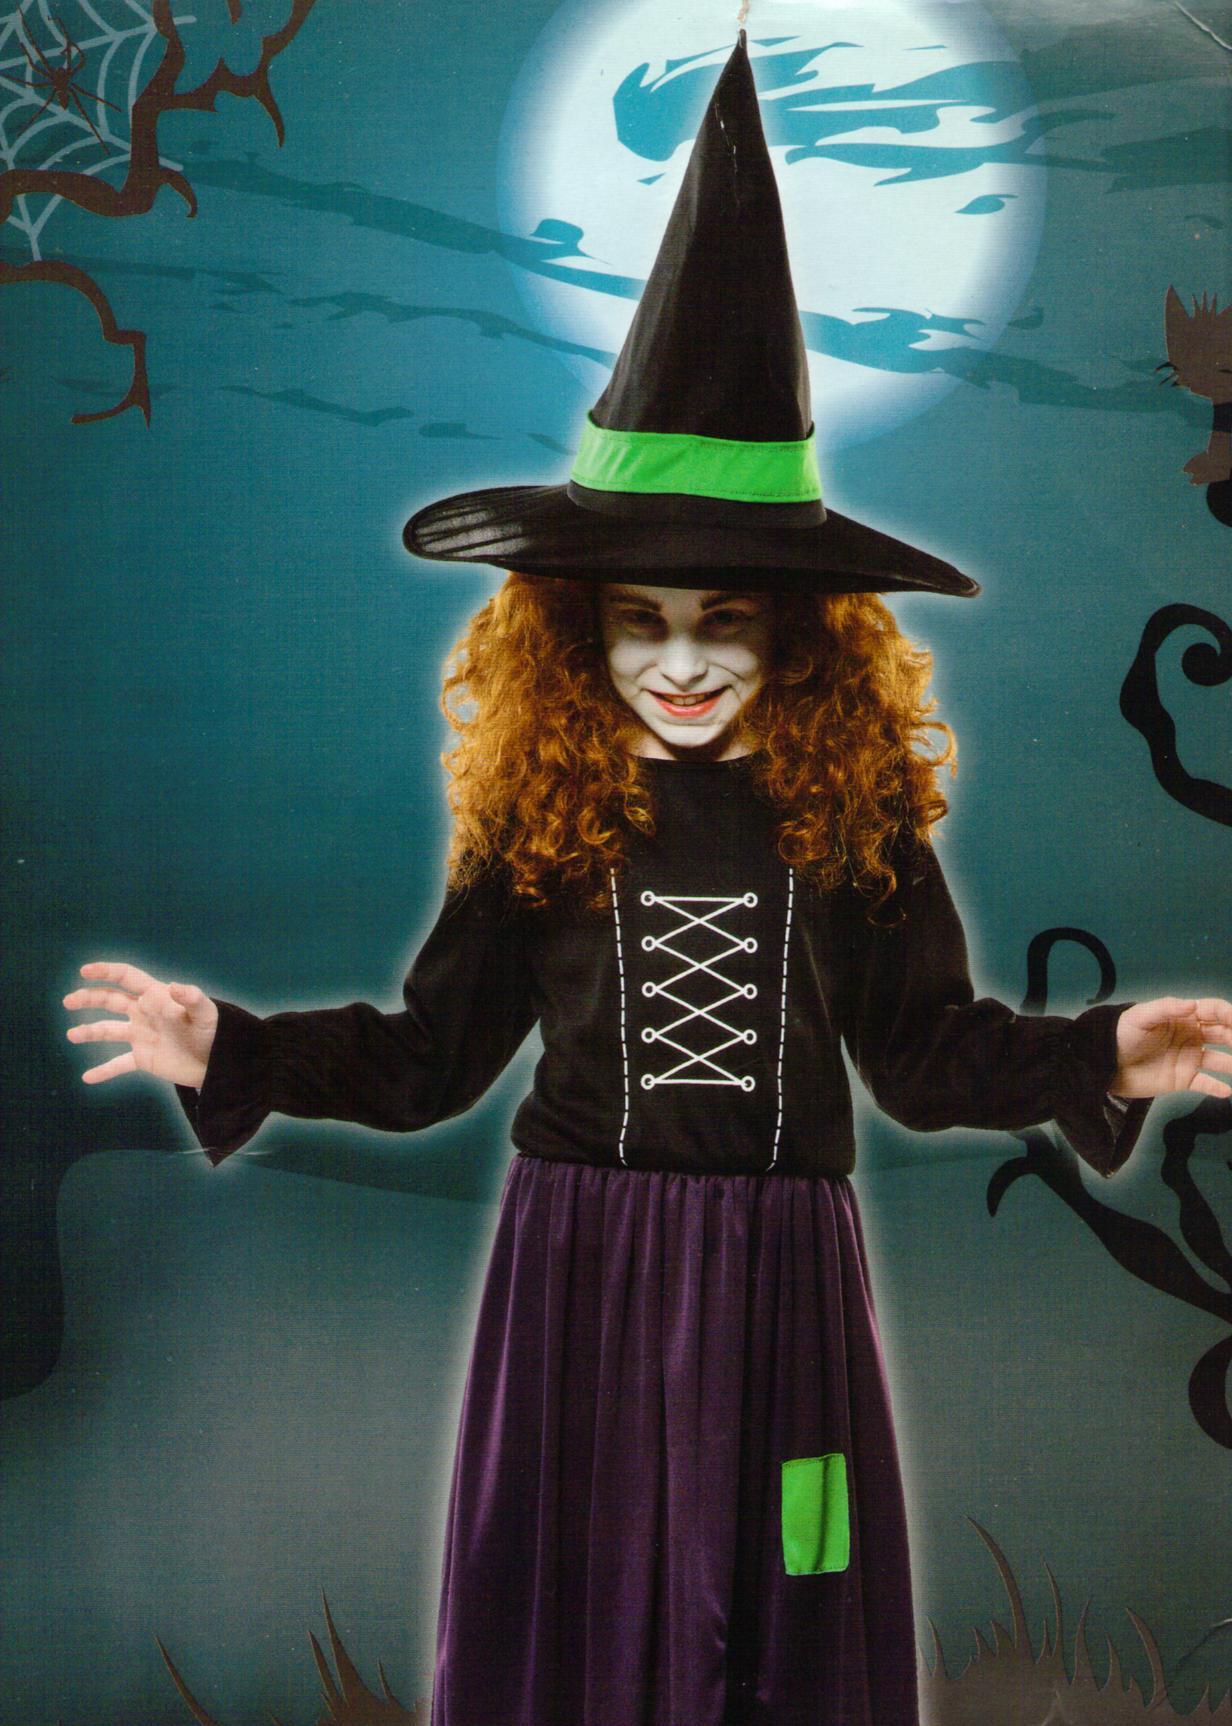 kinder kost m hexe zauberin grusel halloween horror fasching karneval gr e s ebay. Black Bedroom Furniture Sets. Home Design Ideas